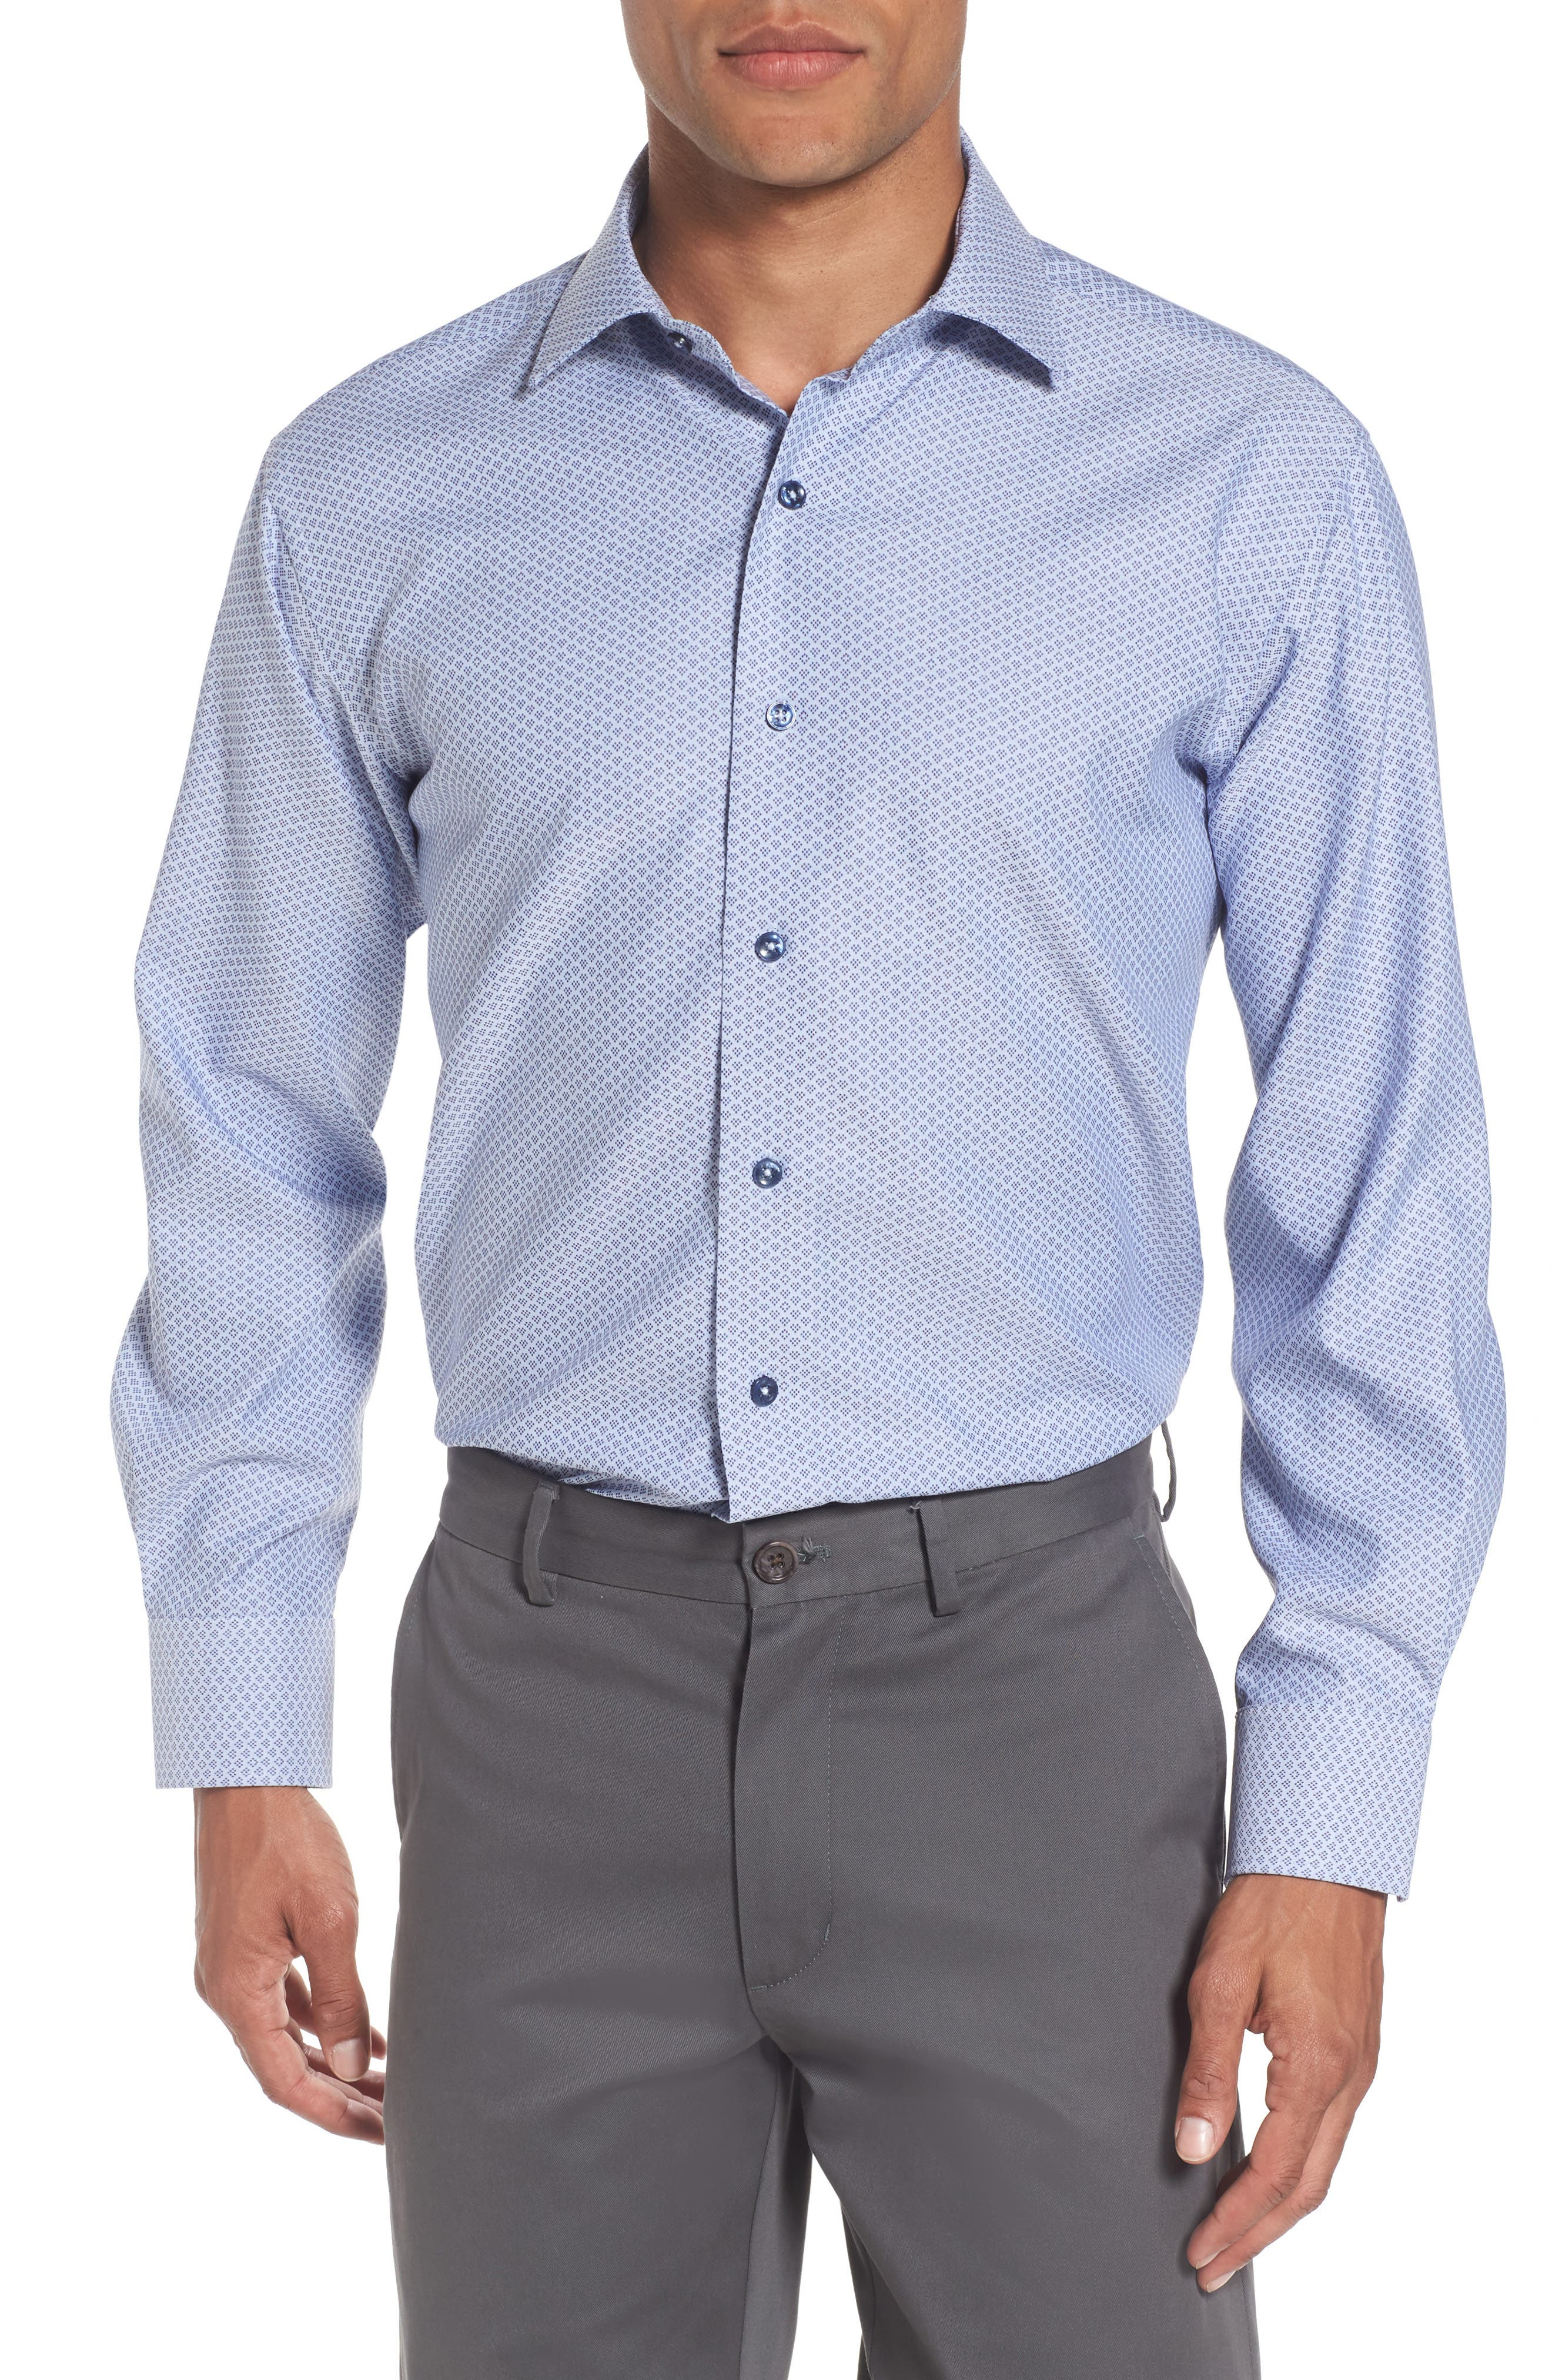 Alternate Image 1 Selected - Lorenzo Uomo Trim Fit Geometric Dress Shirt